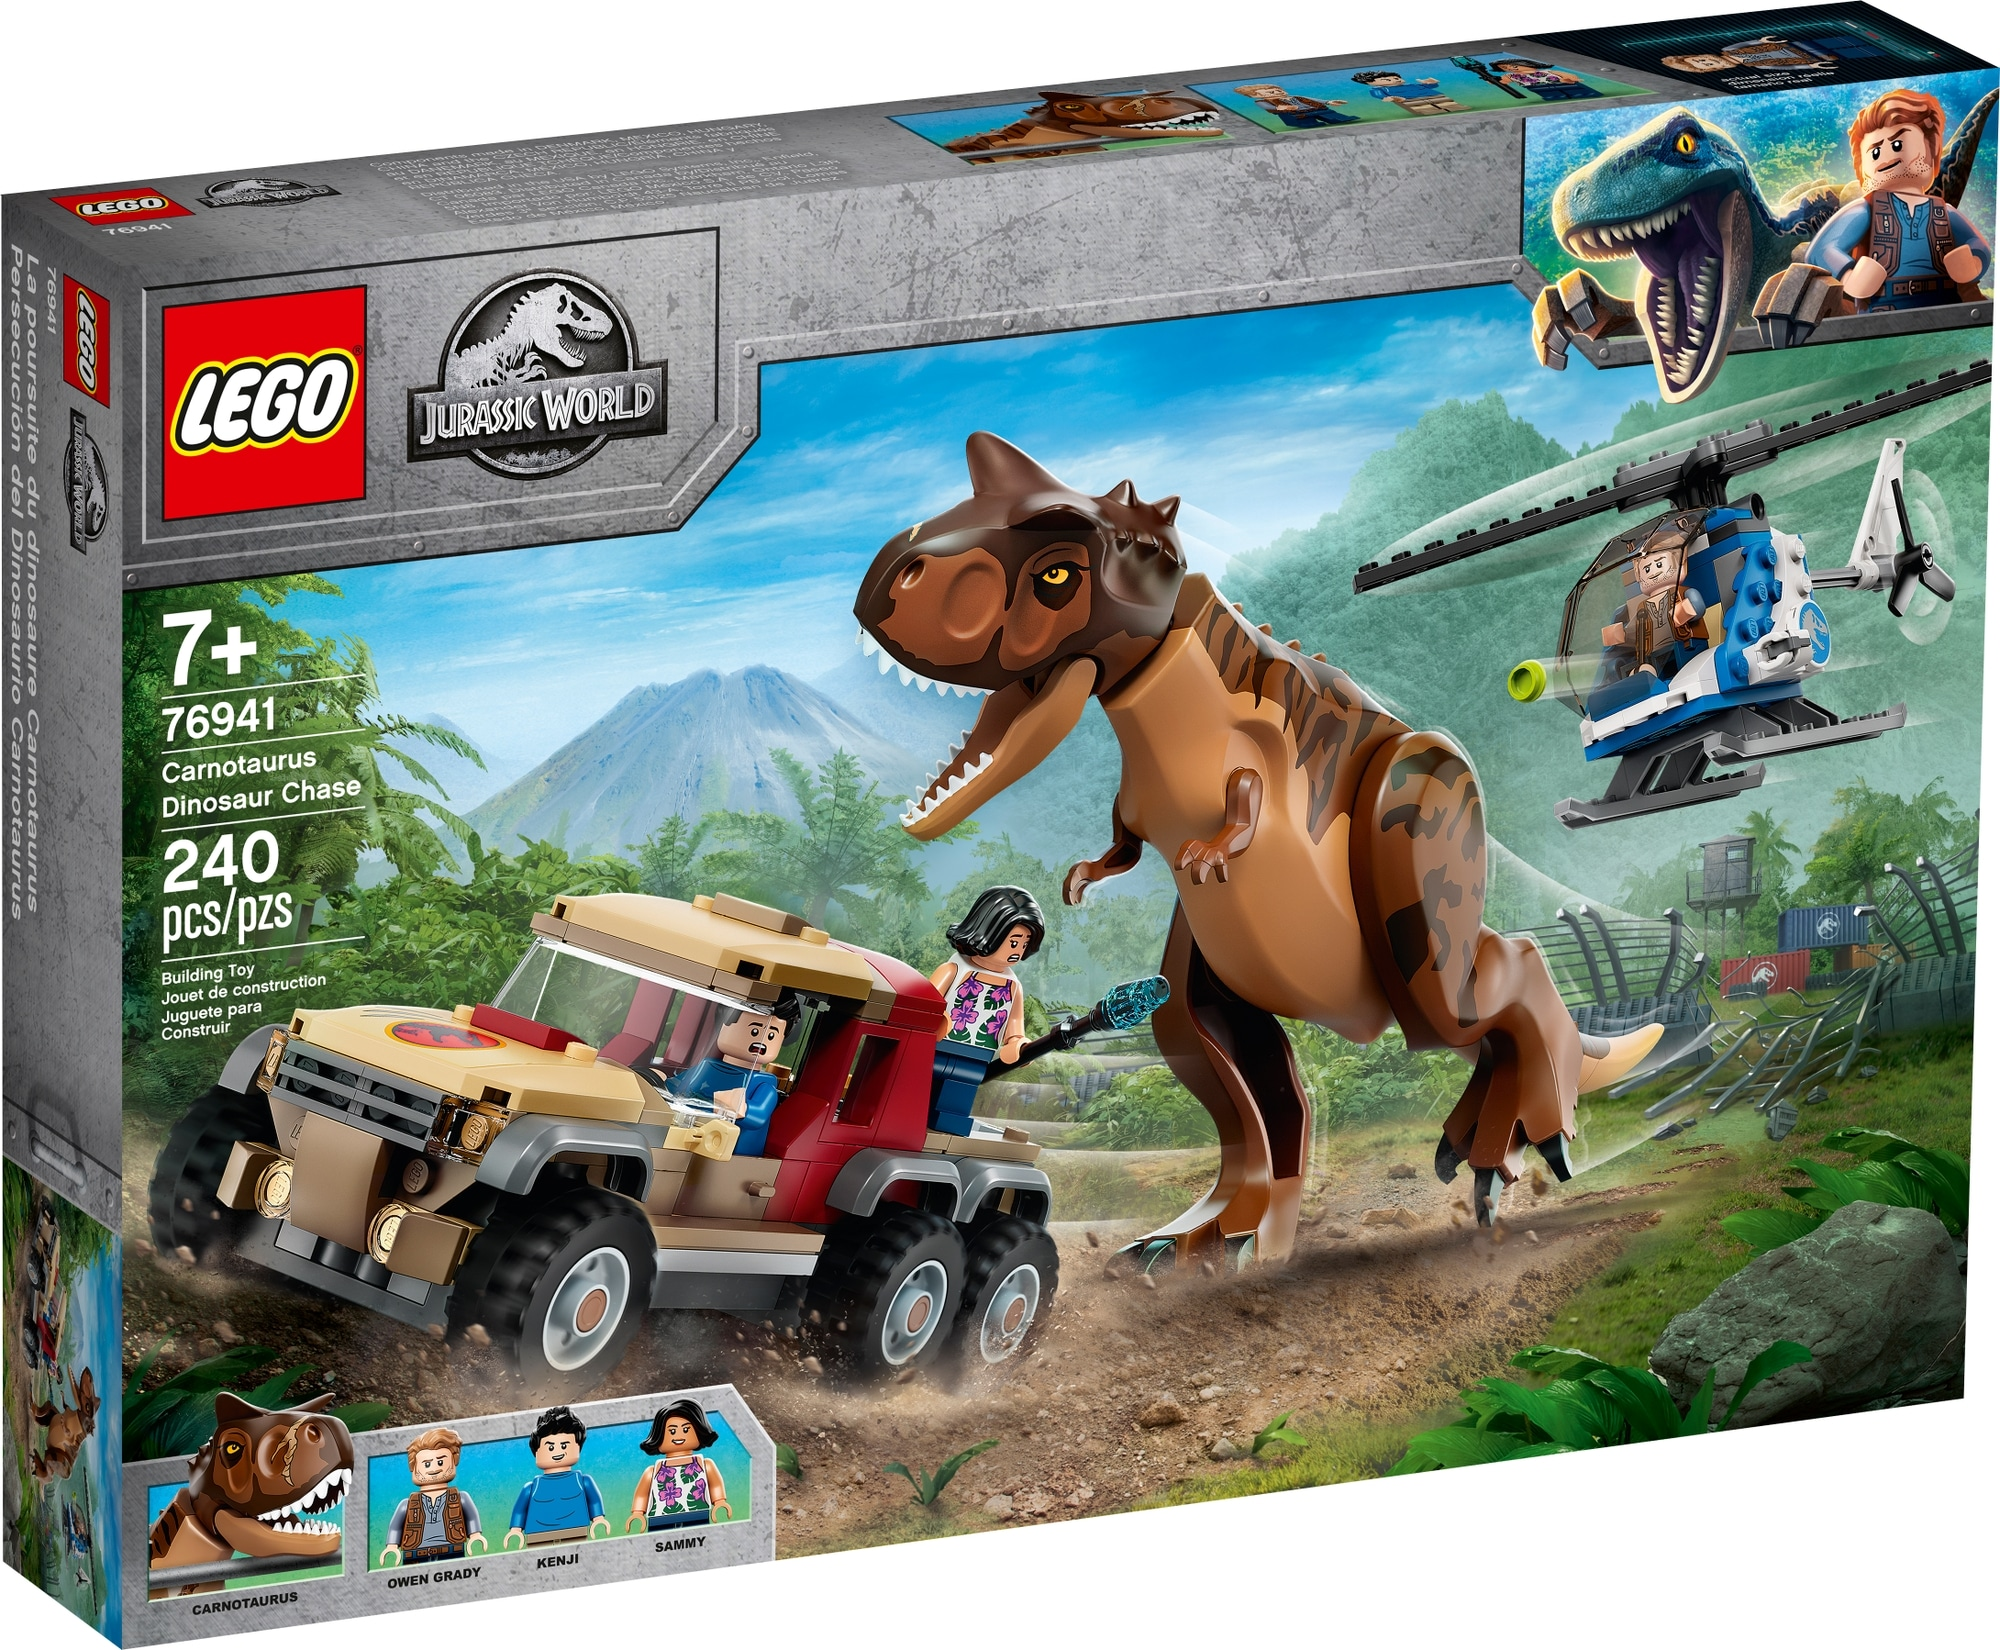 LEGO Jurassic World 76941 Verfolgung Des Carnotaurus 2